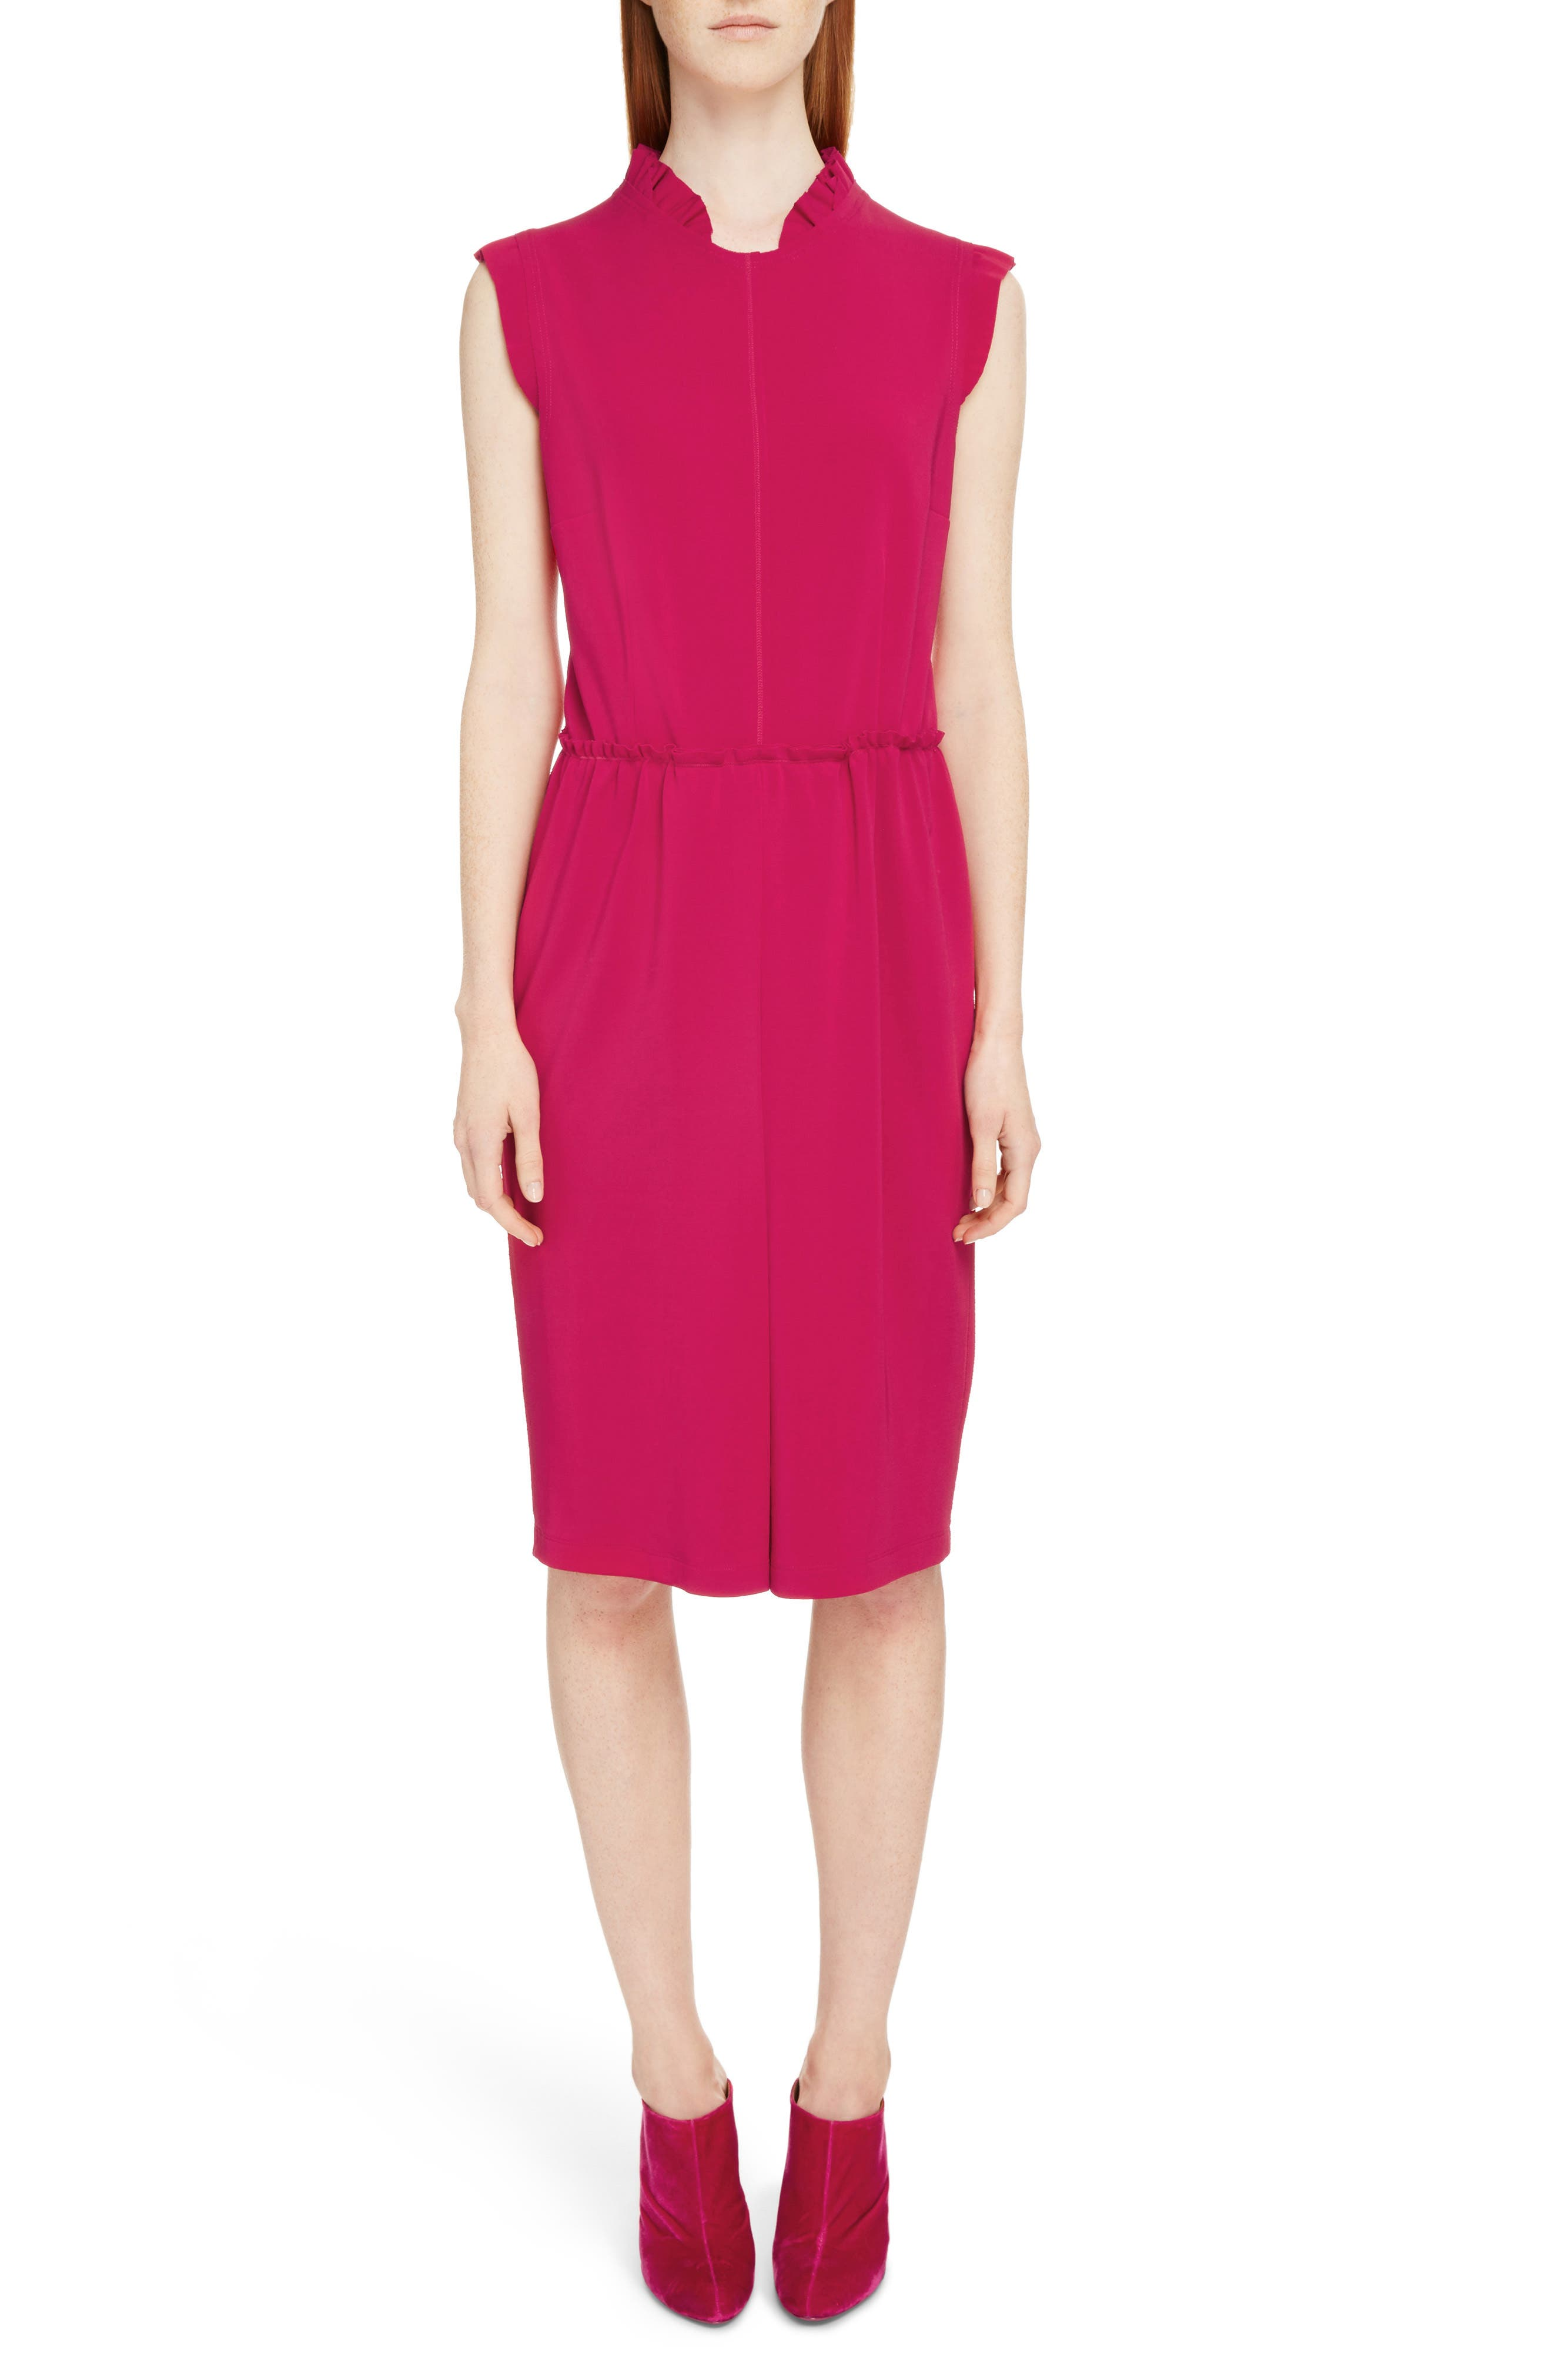 Givenchy Ruffle Trim Jersey Dress